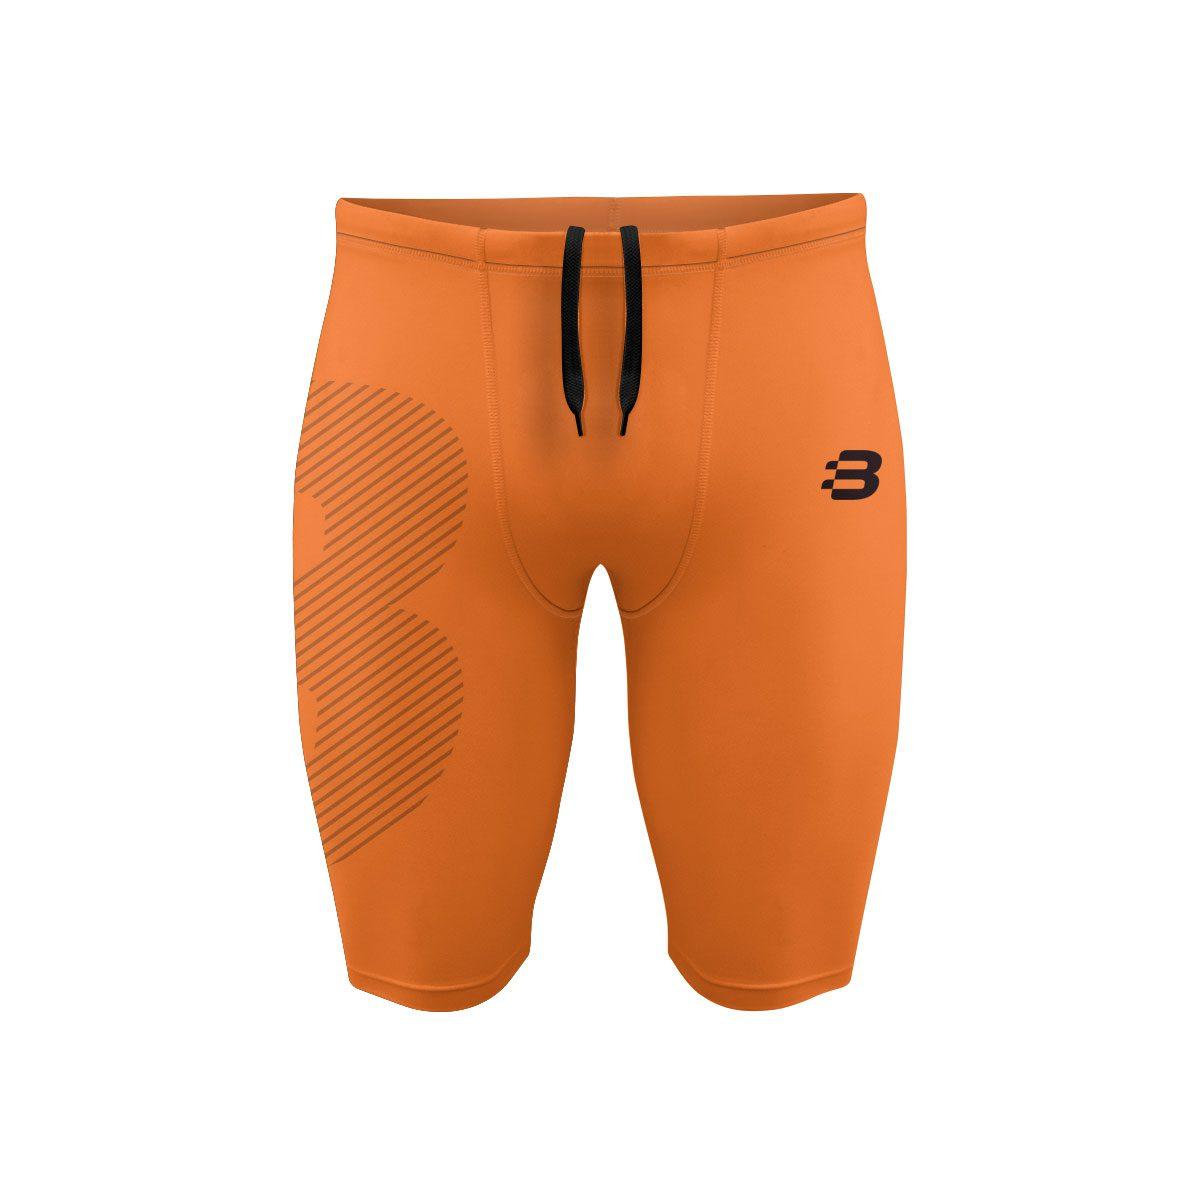 Mens Compression Shorts - Orange